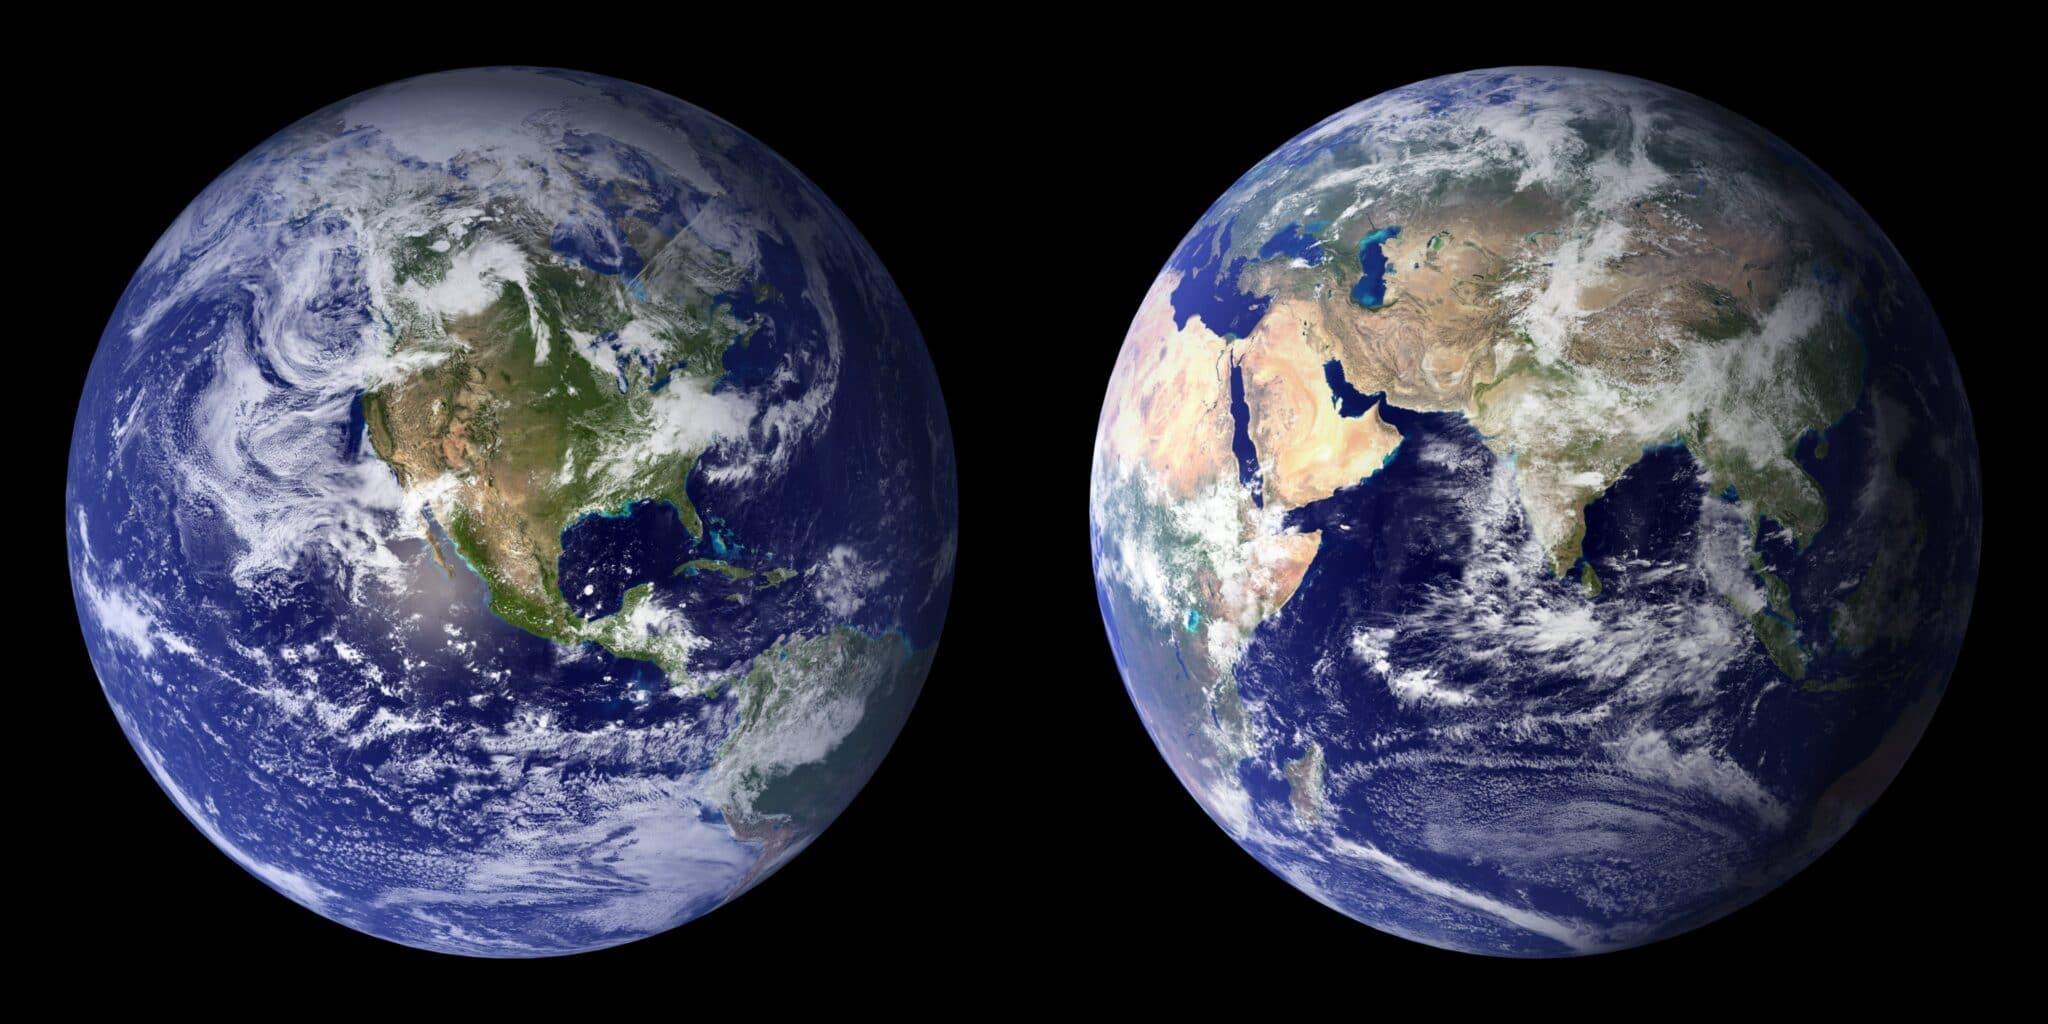 Vista della Terra